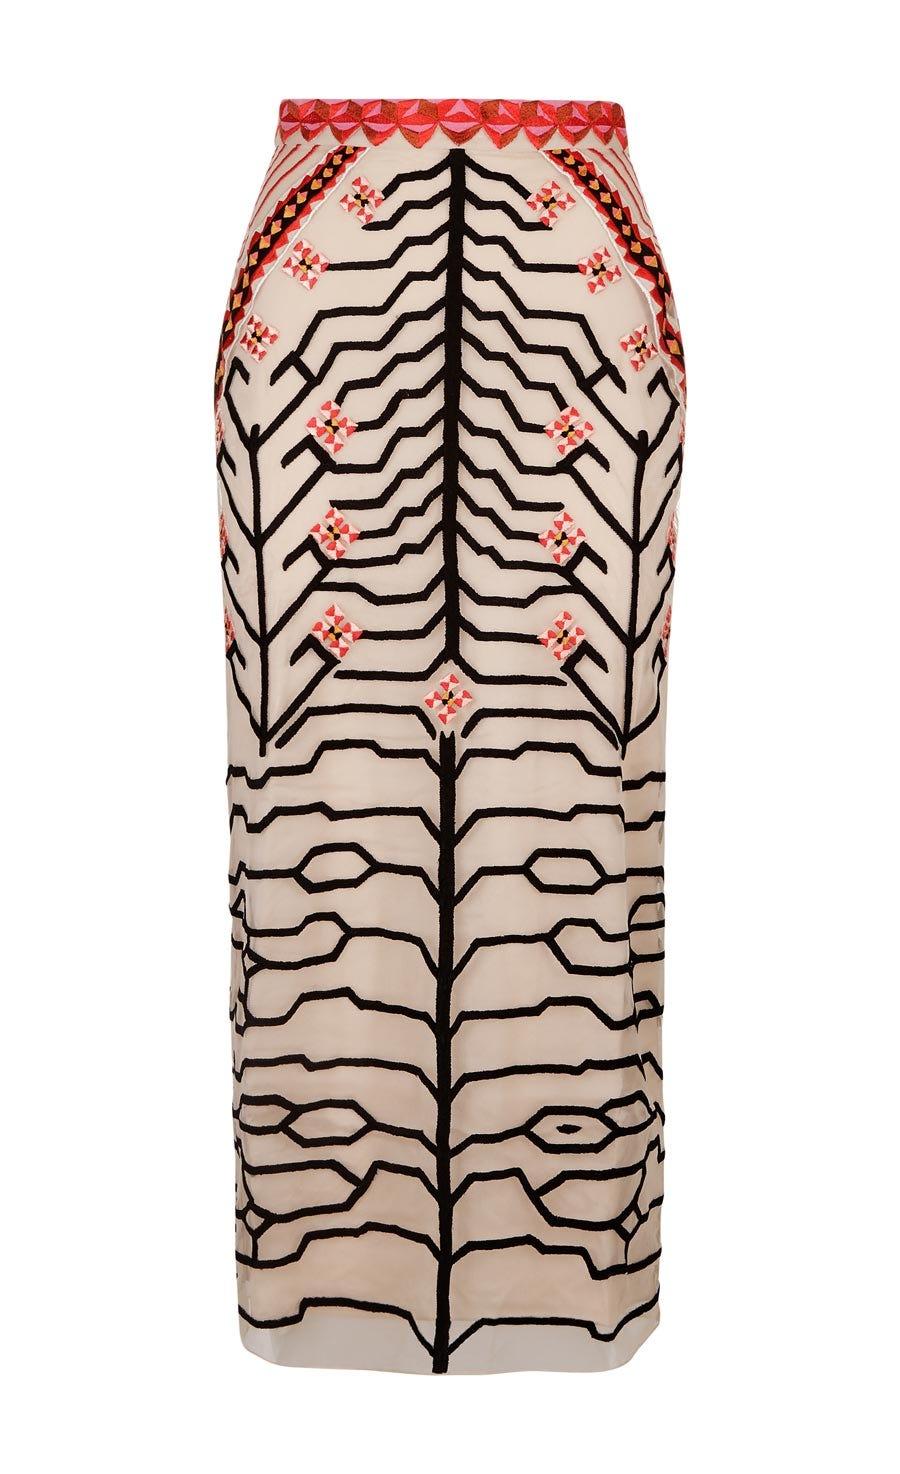 Canopy Pencil Skirt